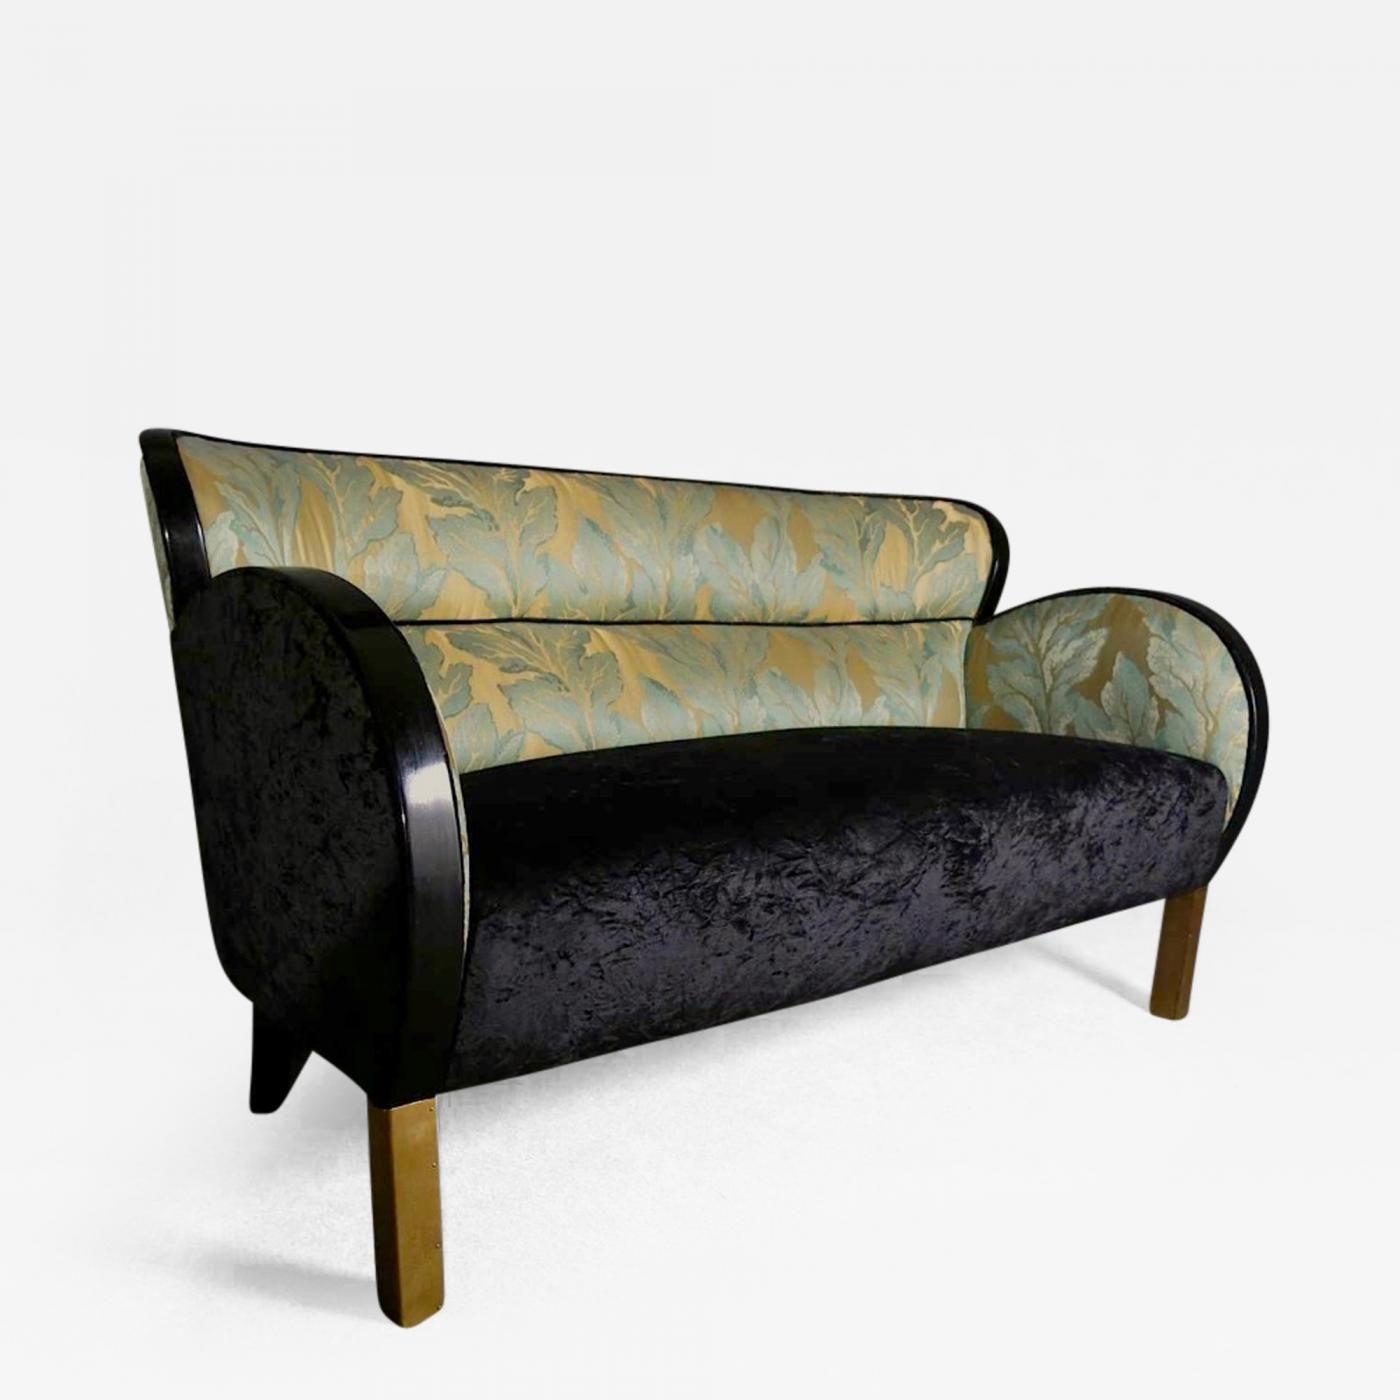 1920s Italian Art Deco Sofa With Damask Velvet Fabric Art Deco